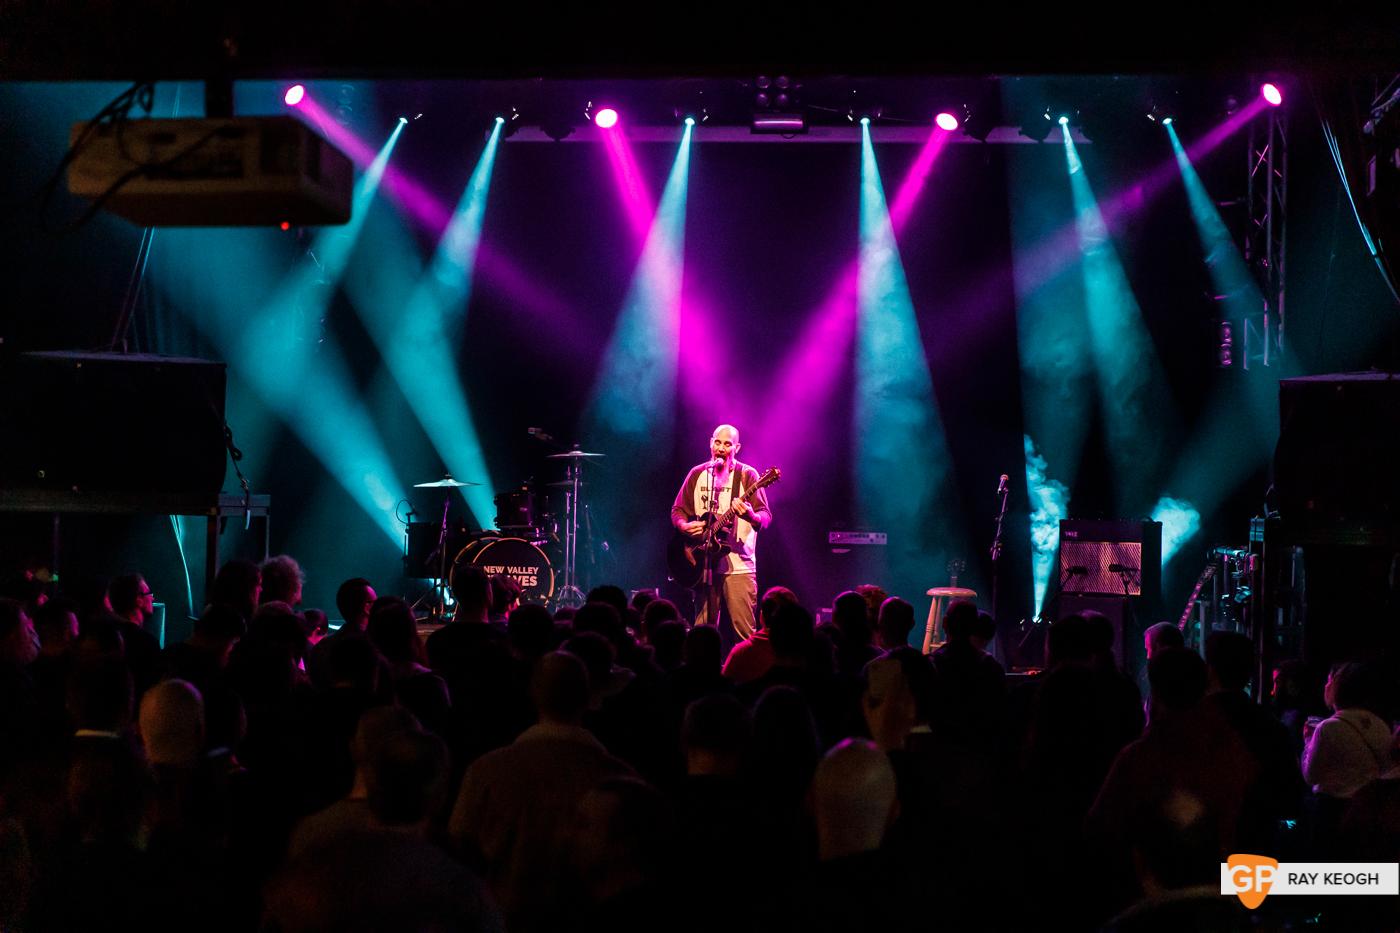 Nick Oliveri – Photo by Ray Keogh